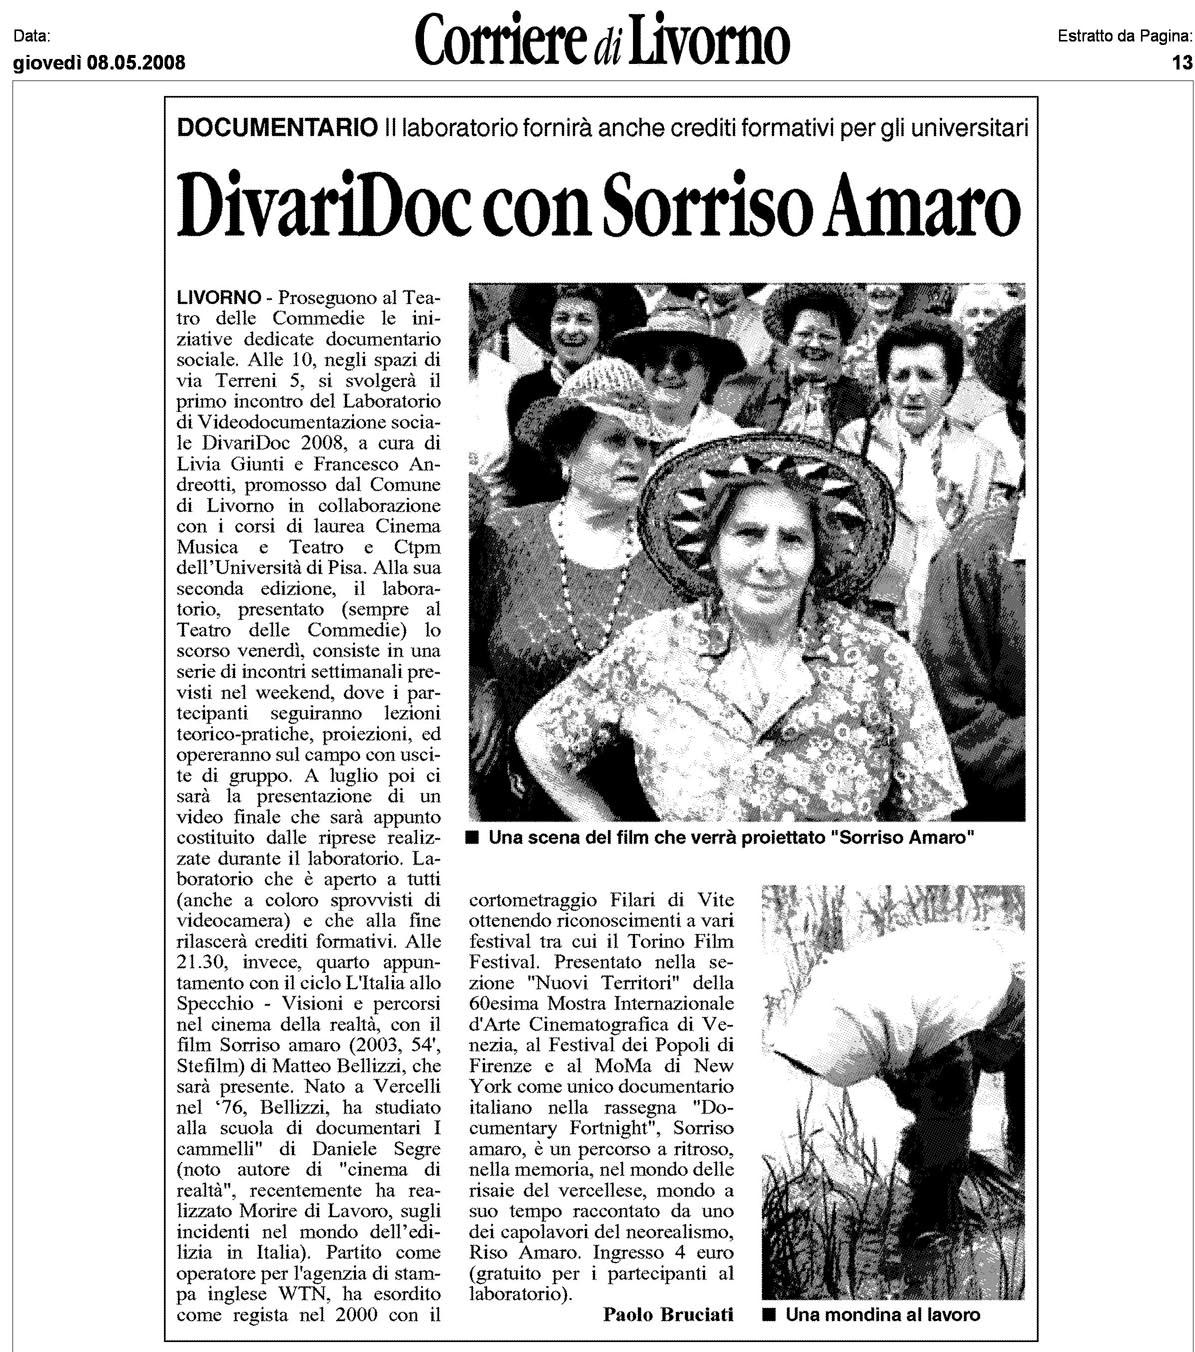 DivariDoc2008_ridotta